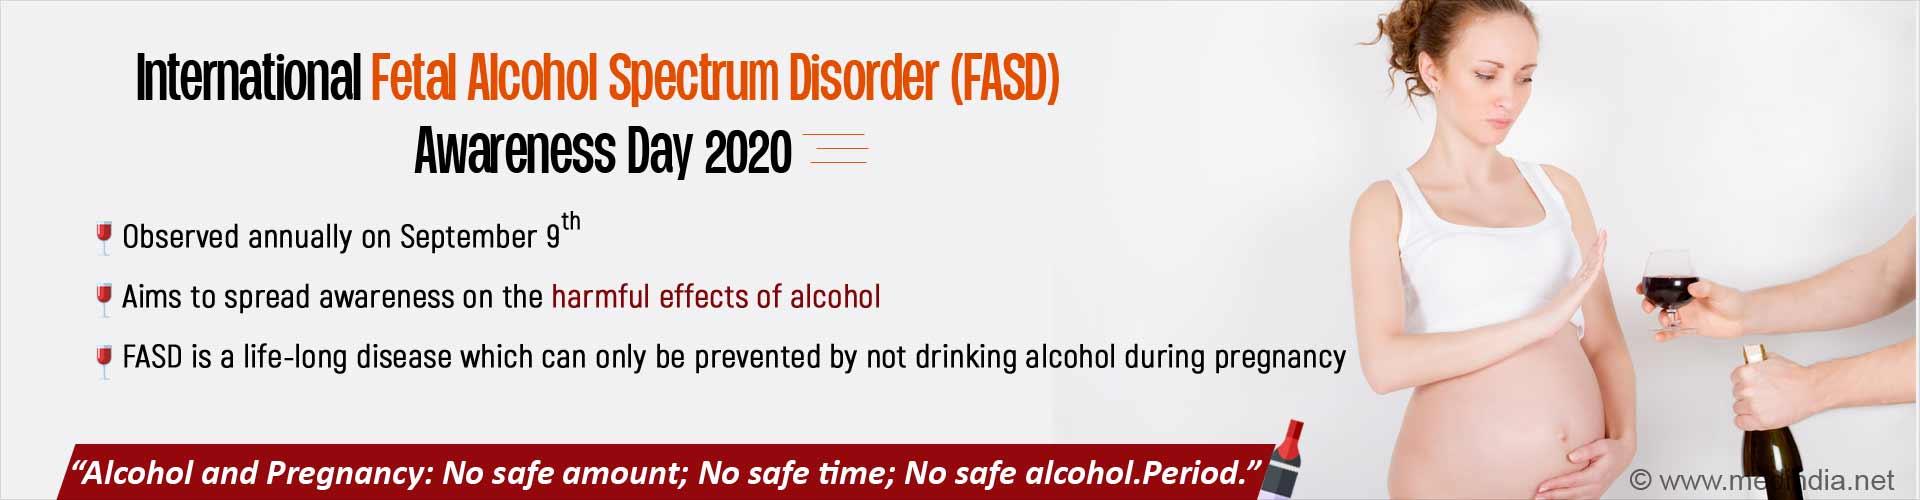 Fetal Alcohol Spectrum Disorder (FASD) Awareness Day